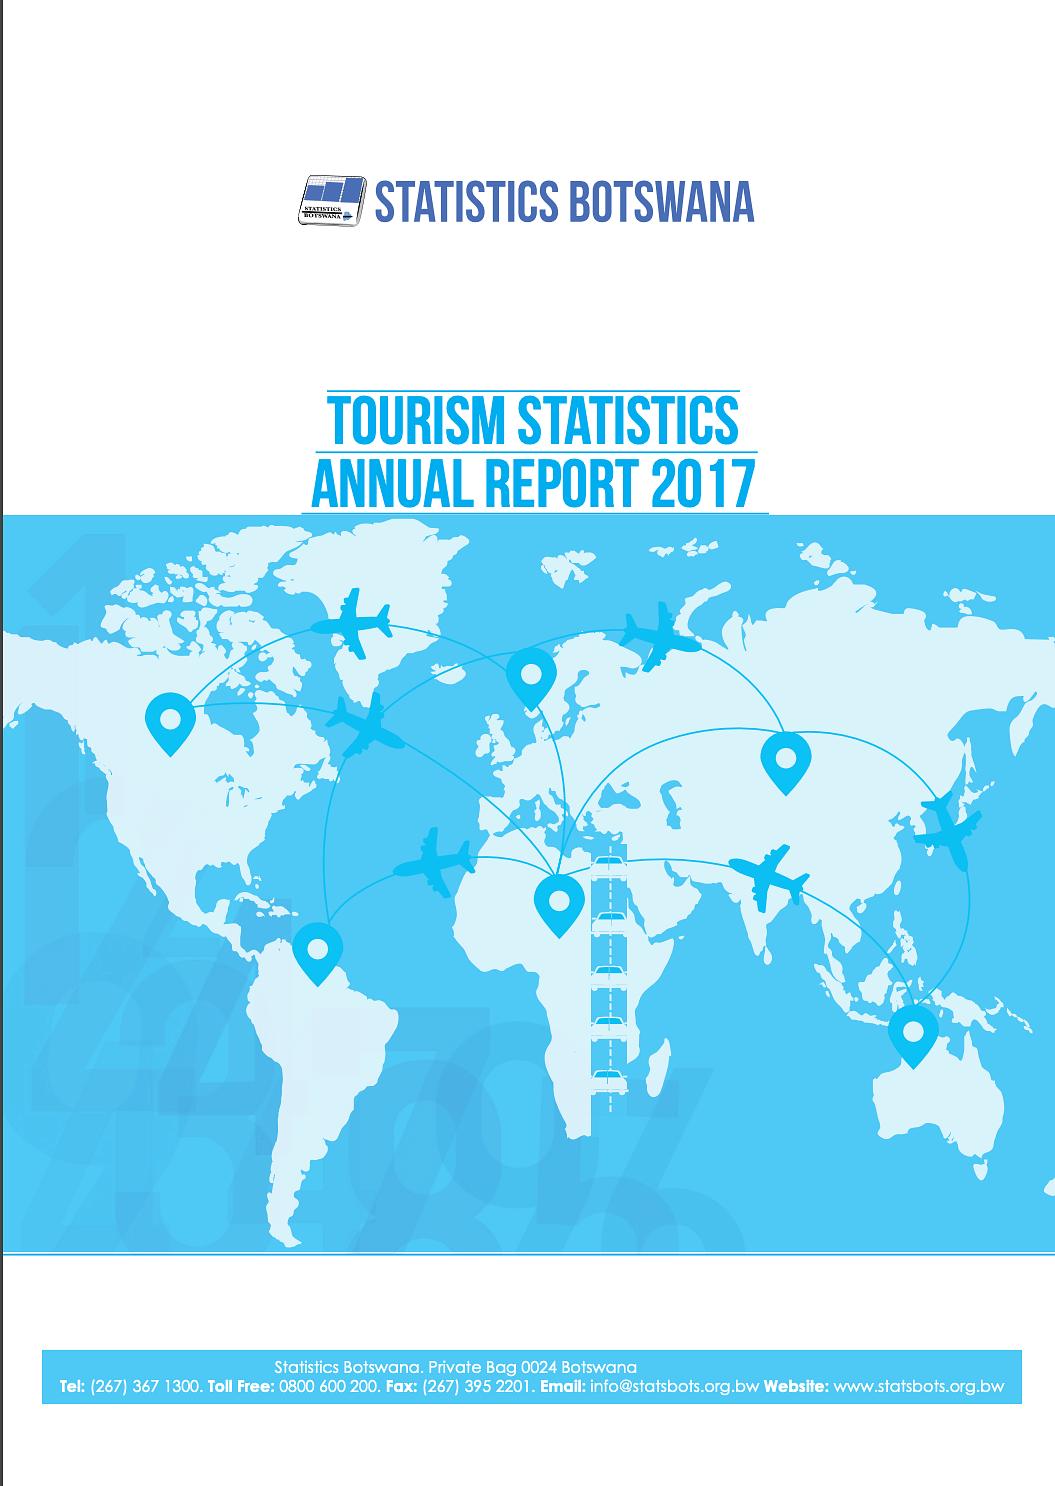 Statistics Botswana Annual Report 2017 cover